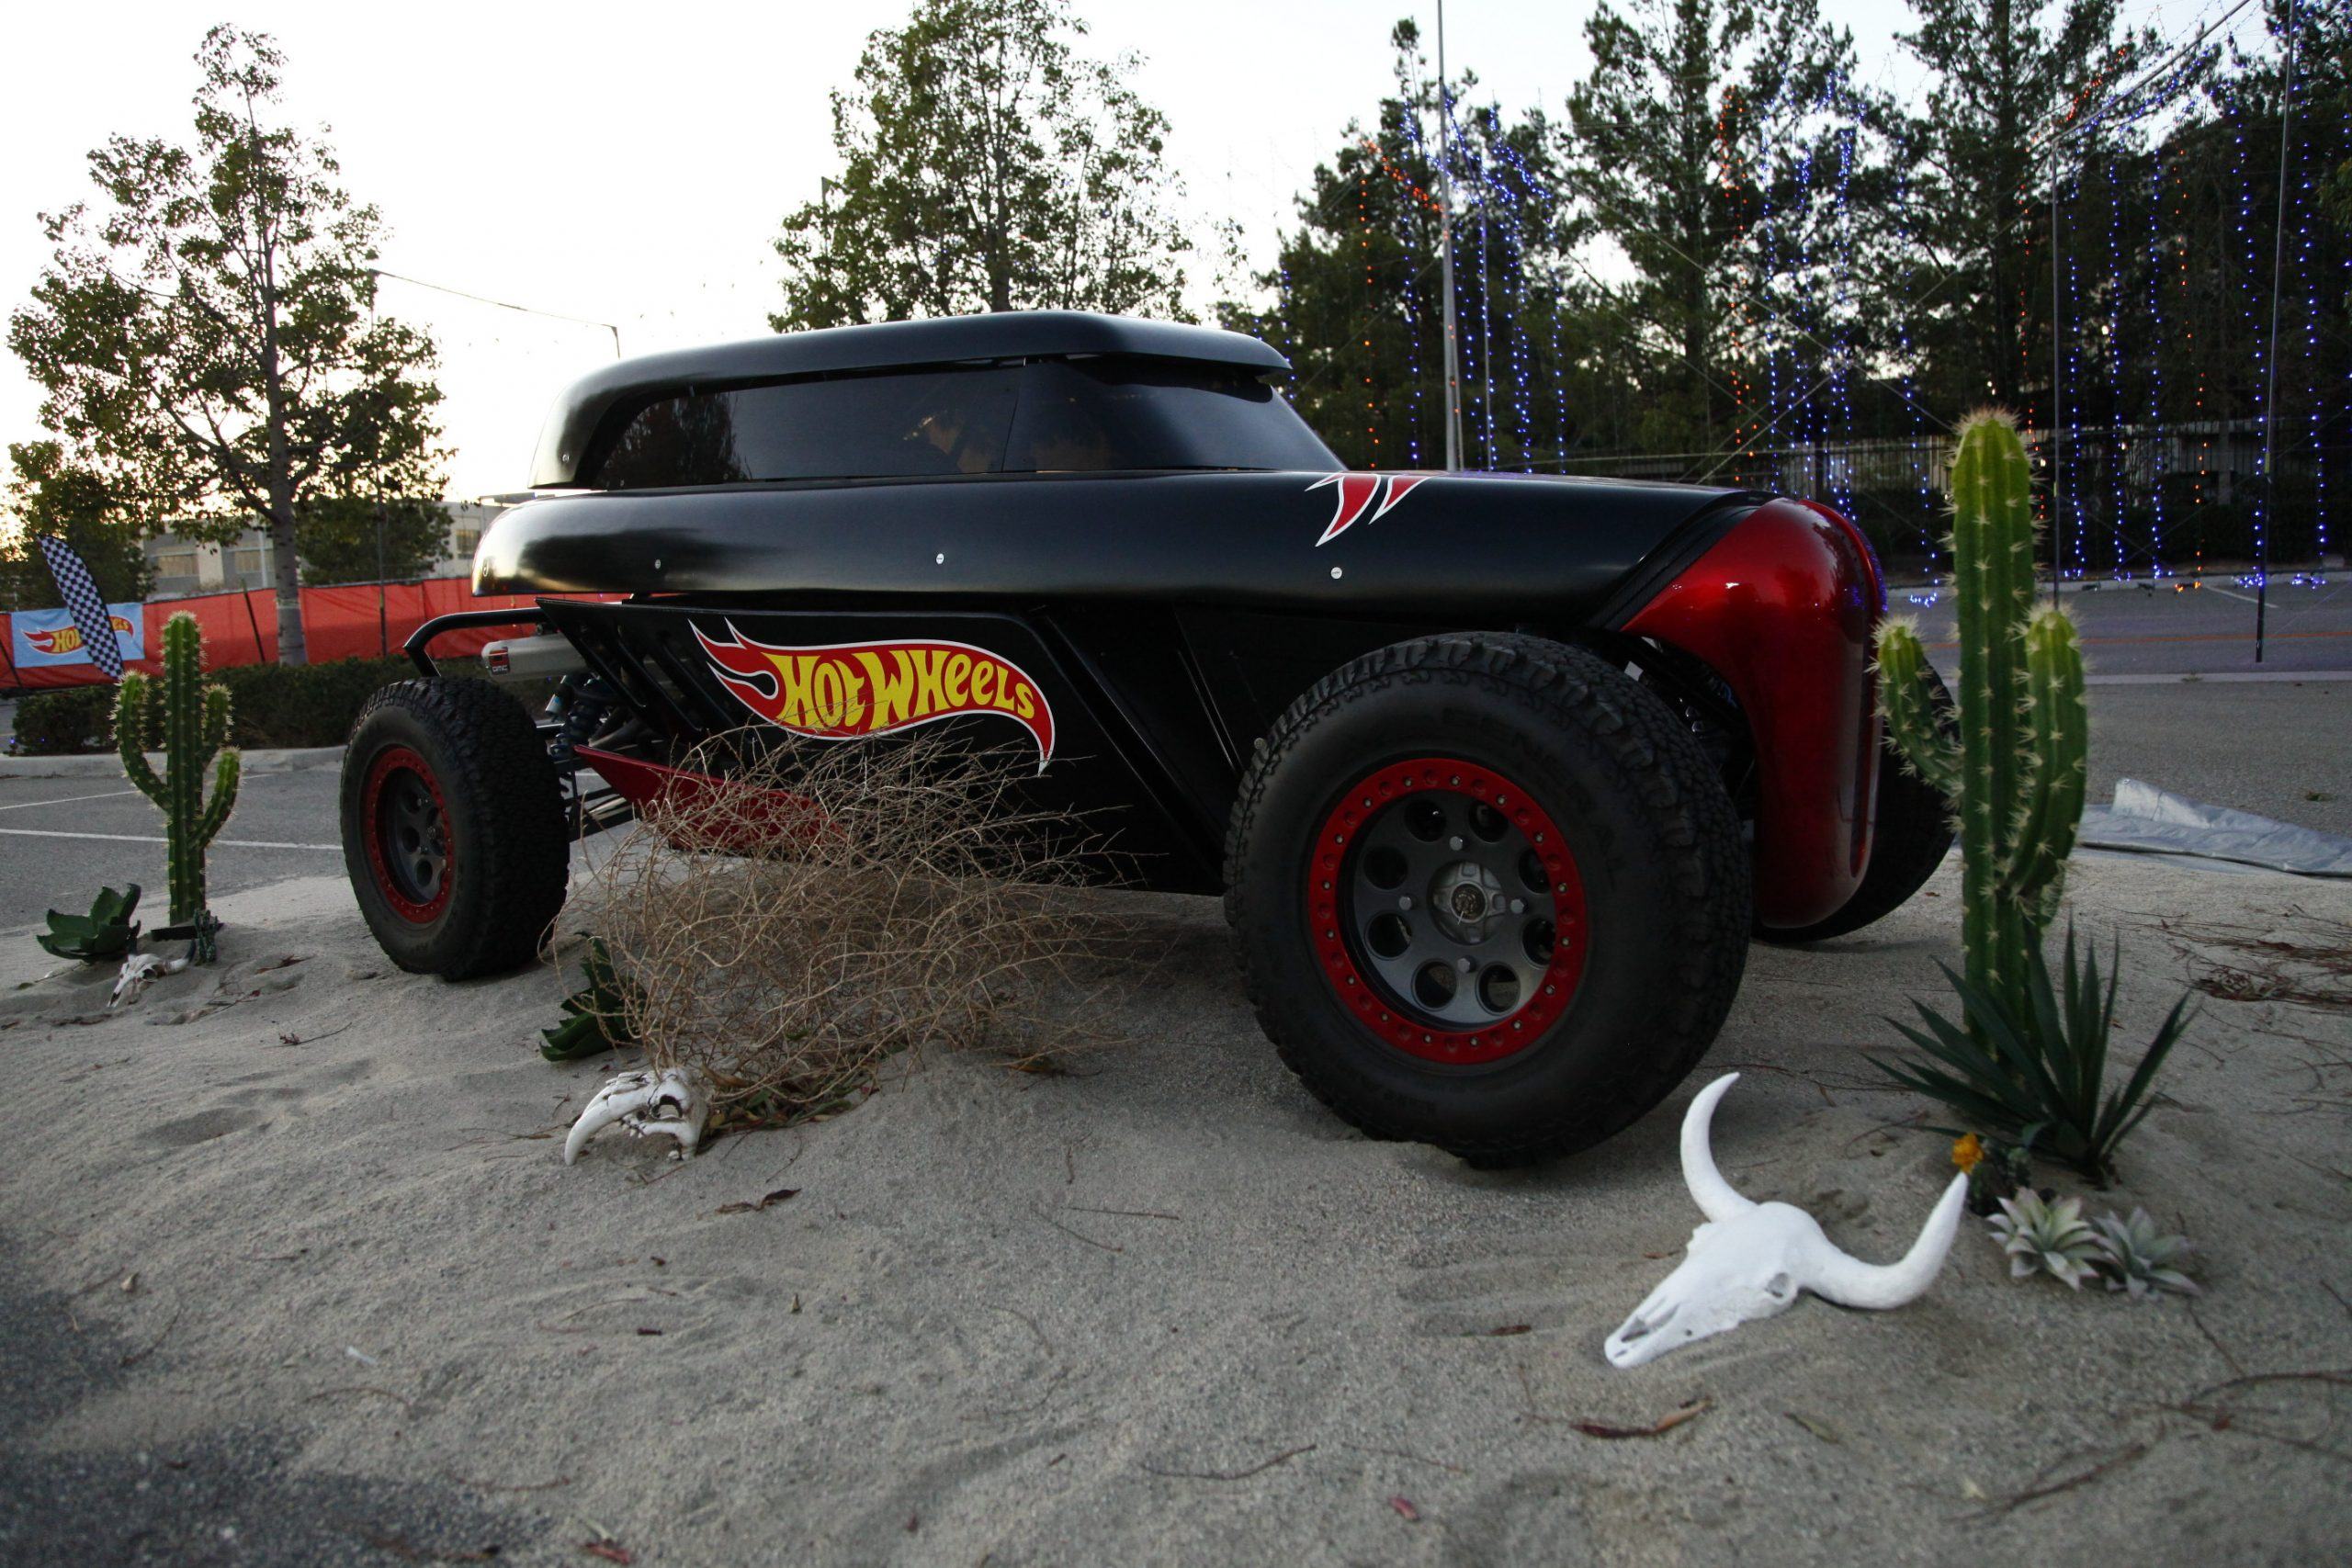 Hot Wheels Ultimate Drive-Thru Coming To Six Flags Over Georgia